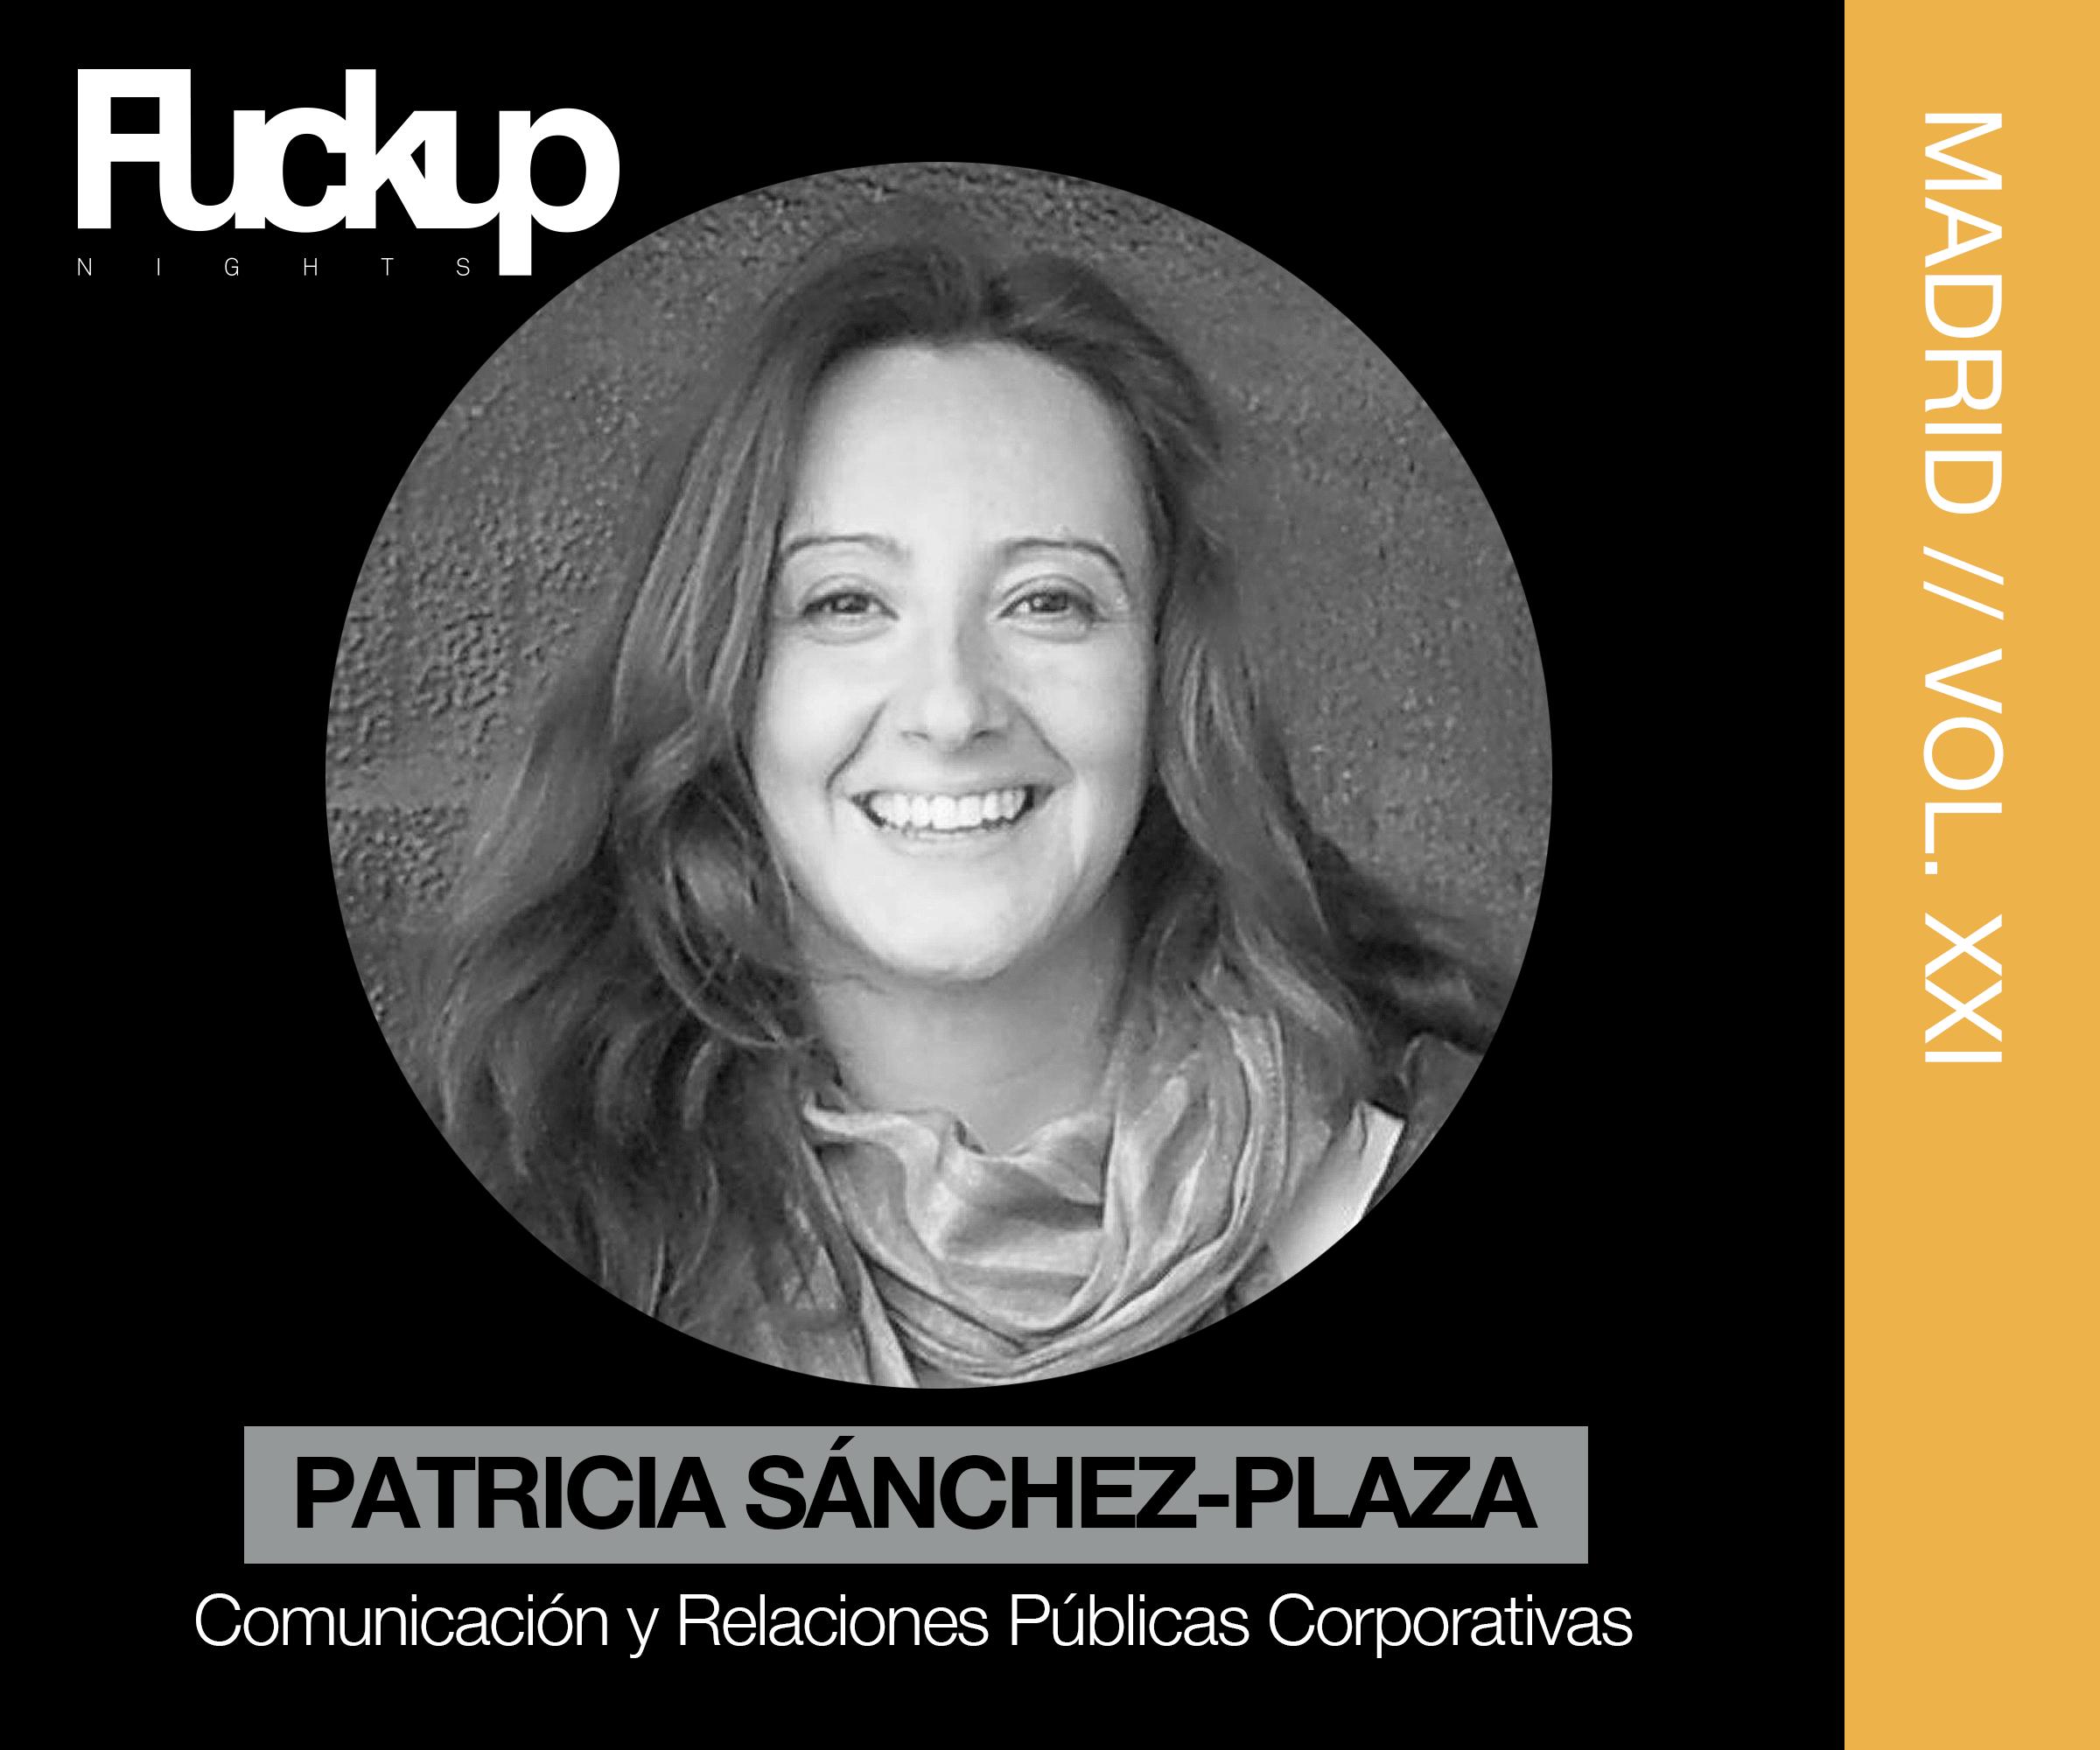 Patricia-Sanchez-Plaza-Fuckup